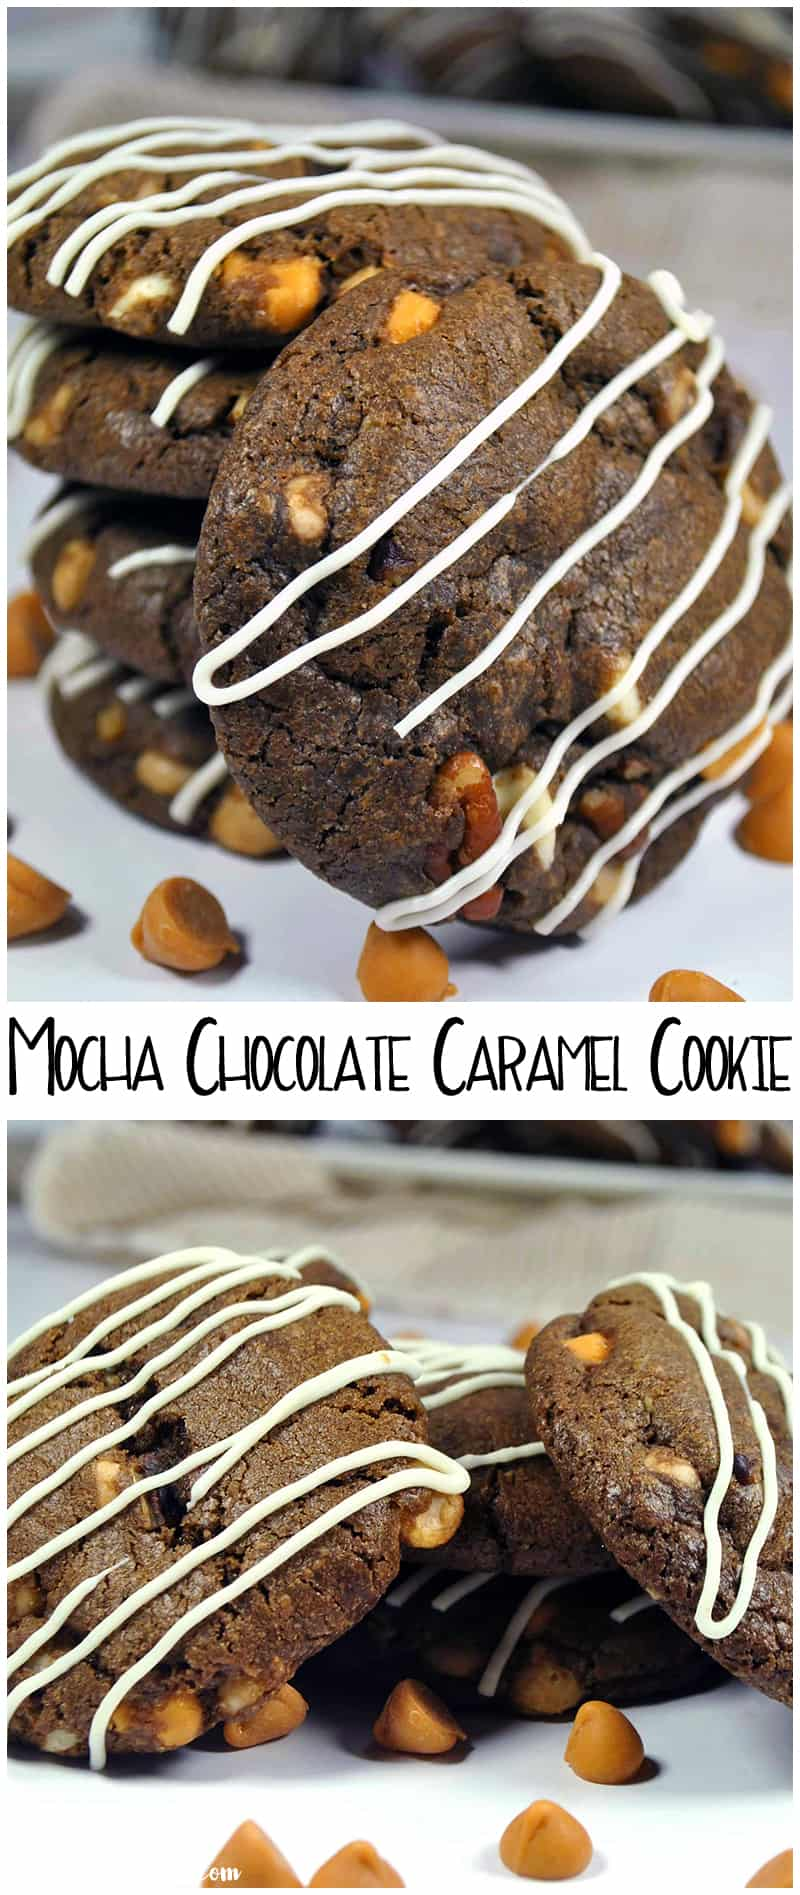 Mocha Chocolate Caramel Cookie Recipe